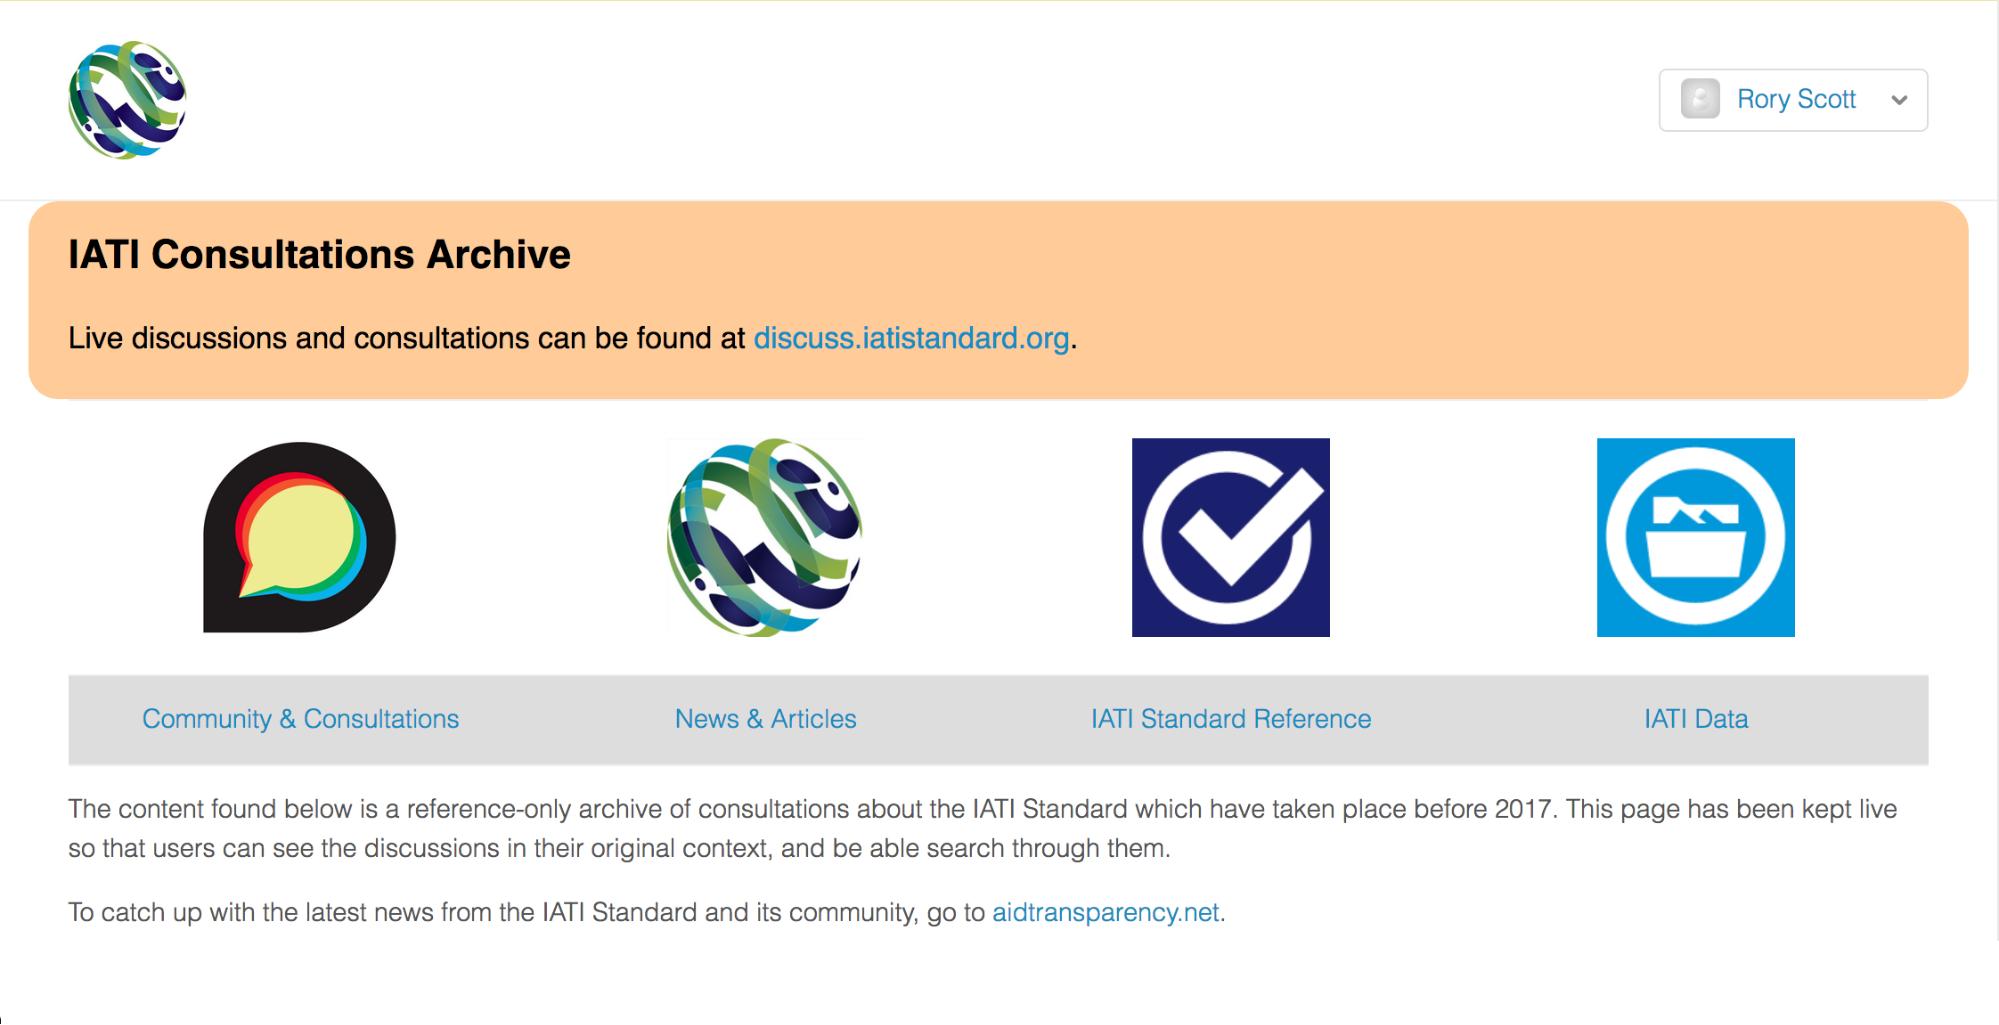 iati-consulations-archive